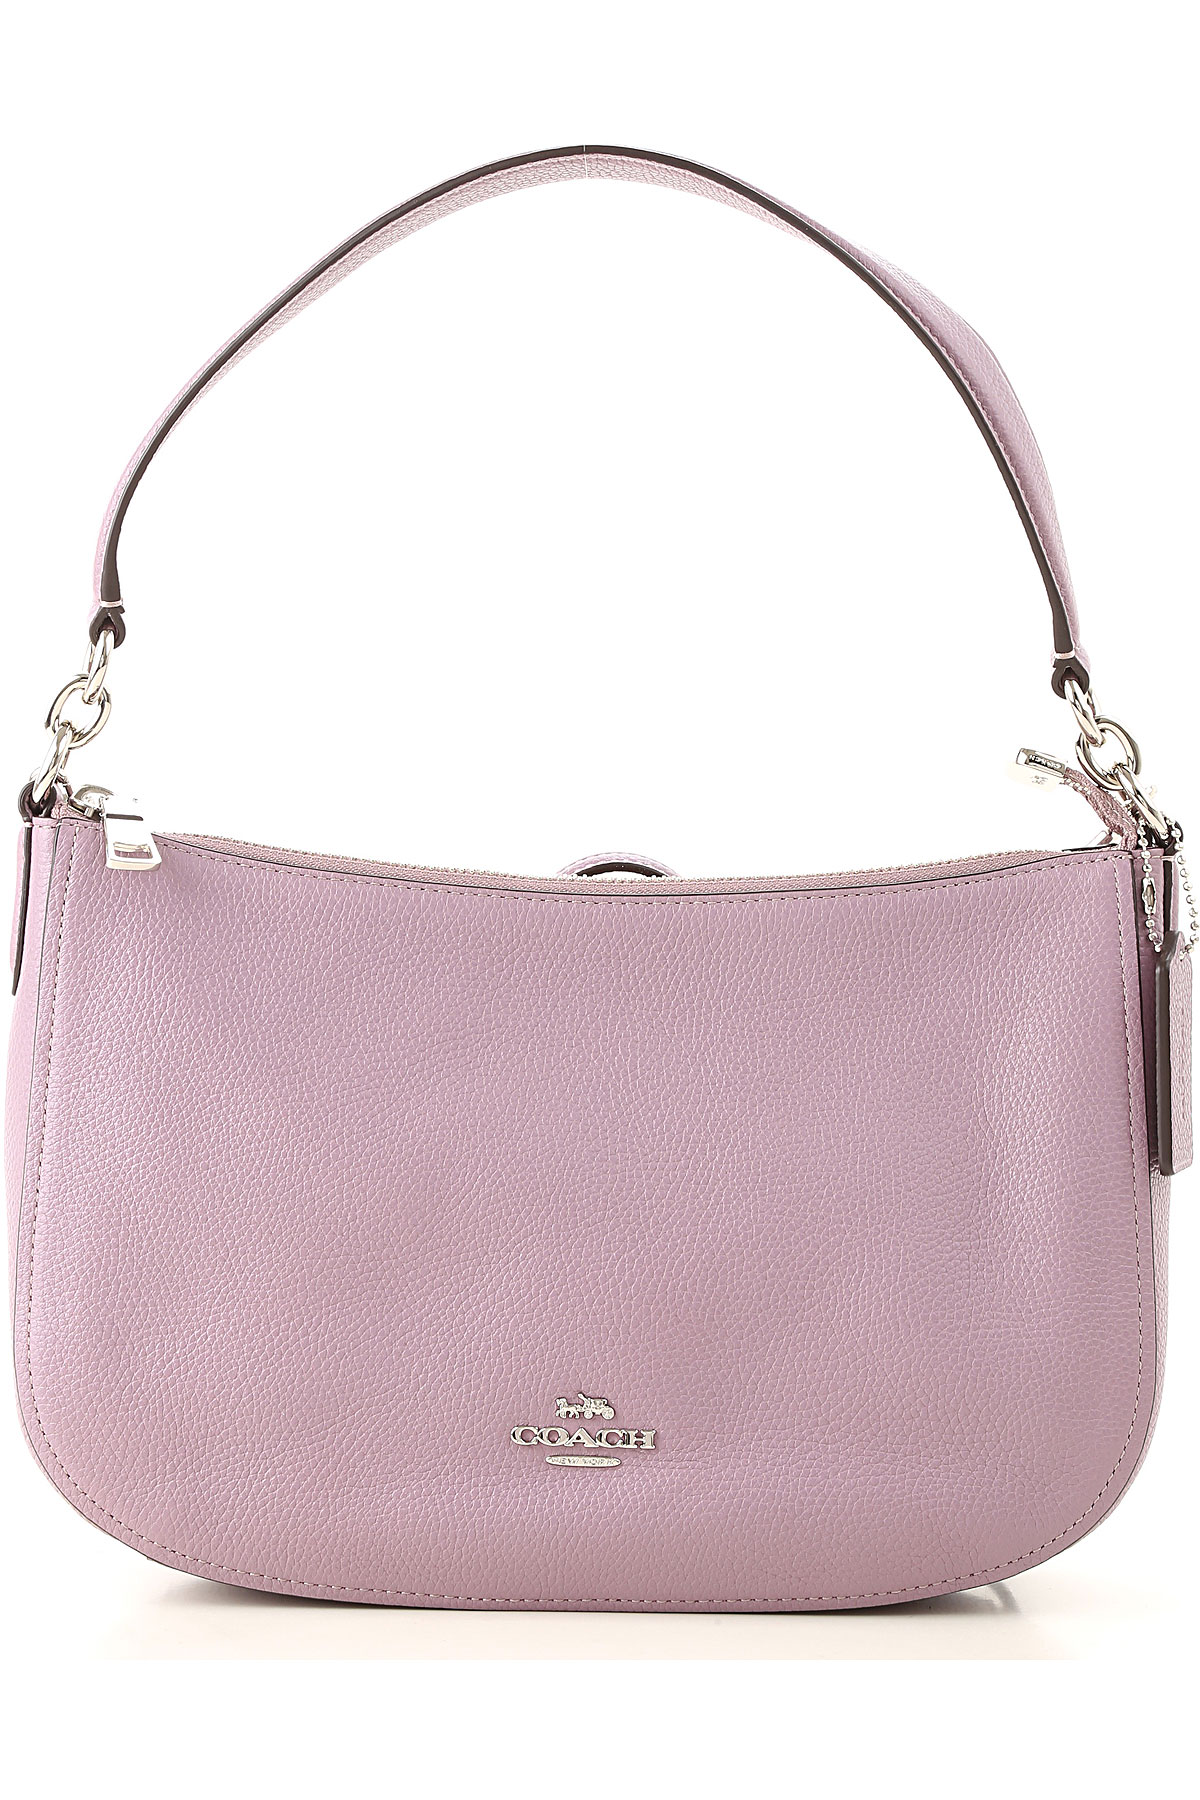 Image of Coach Shoulder Bag for Women, Mauve, Leather, 2017